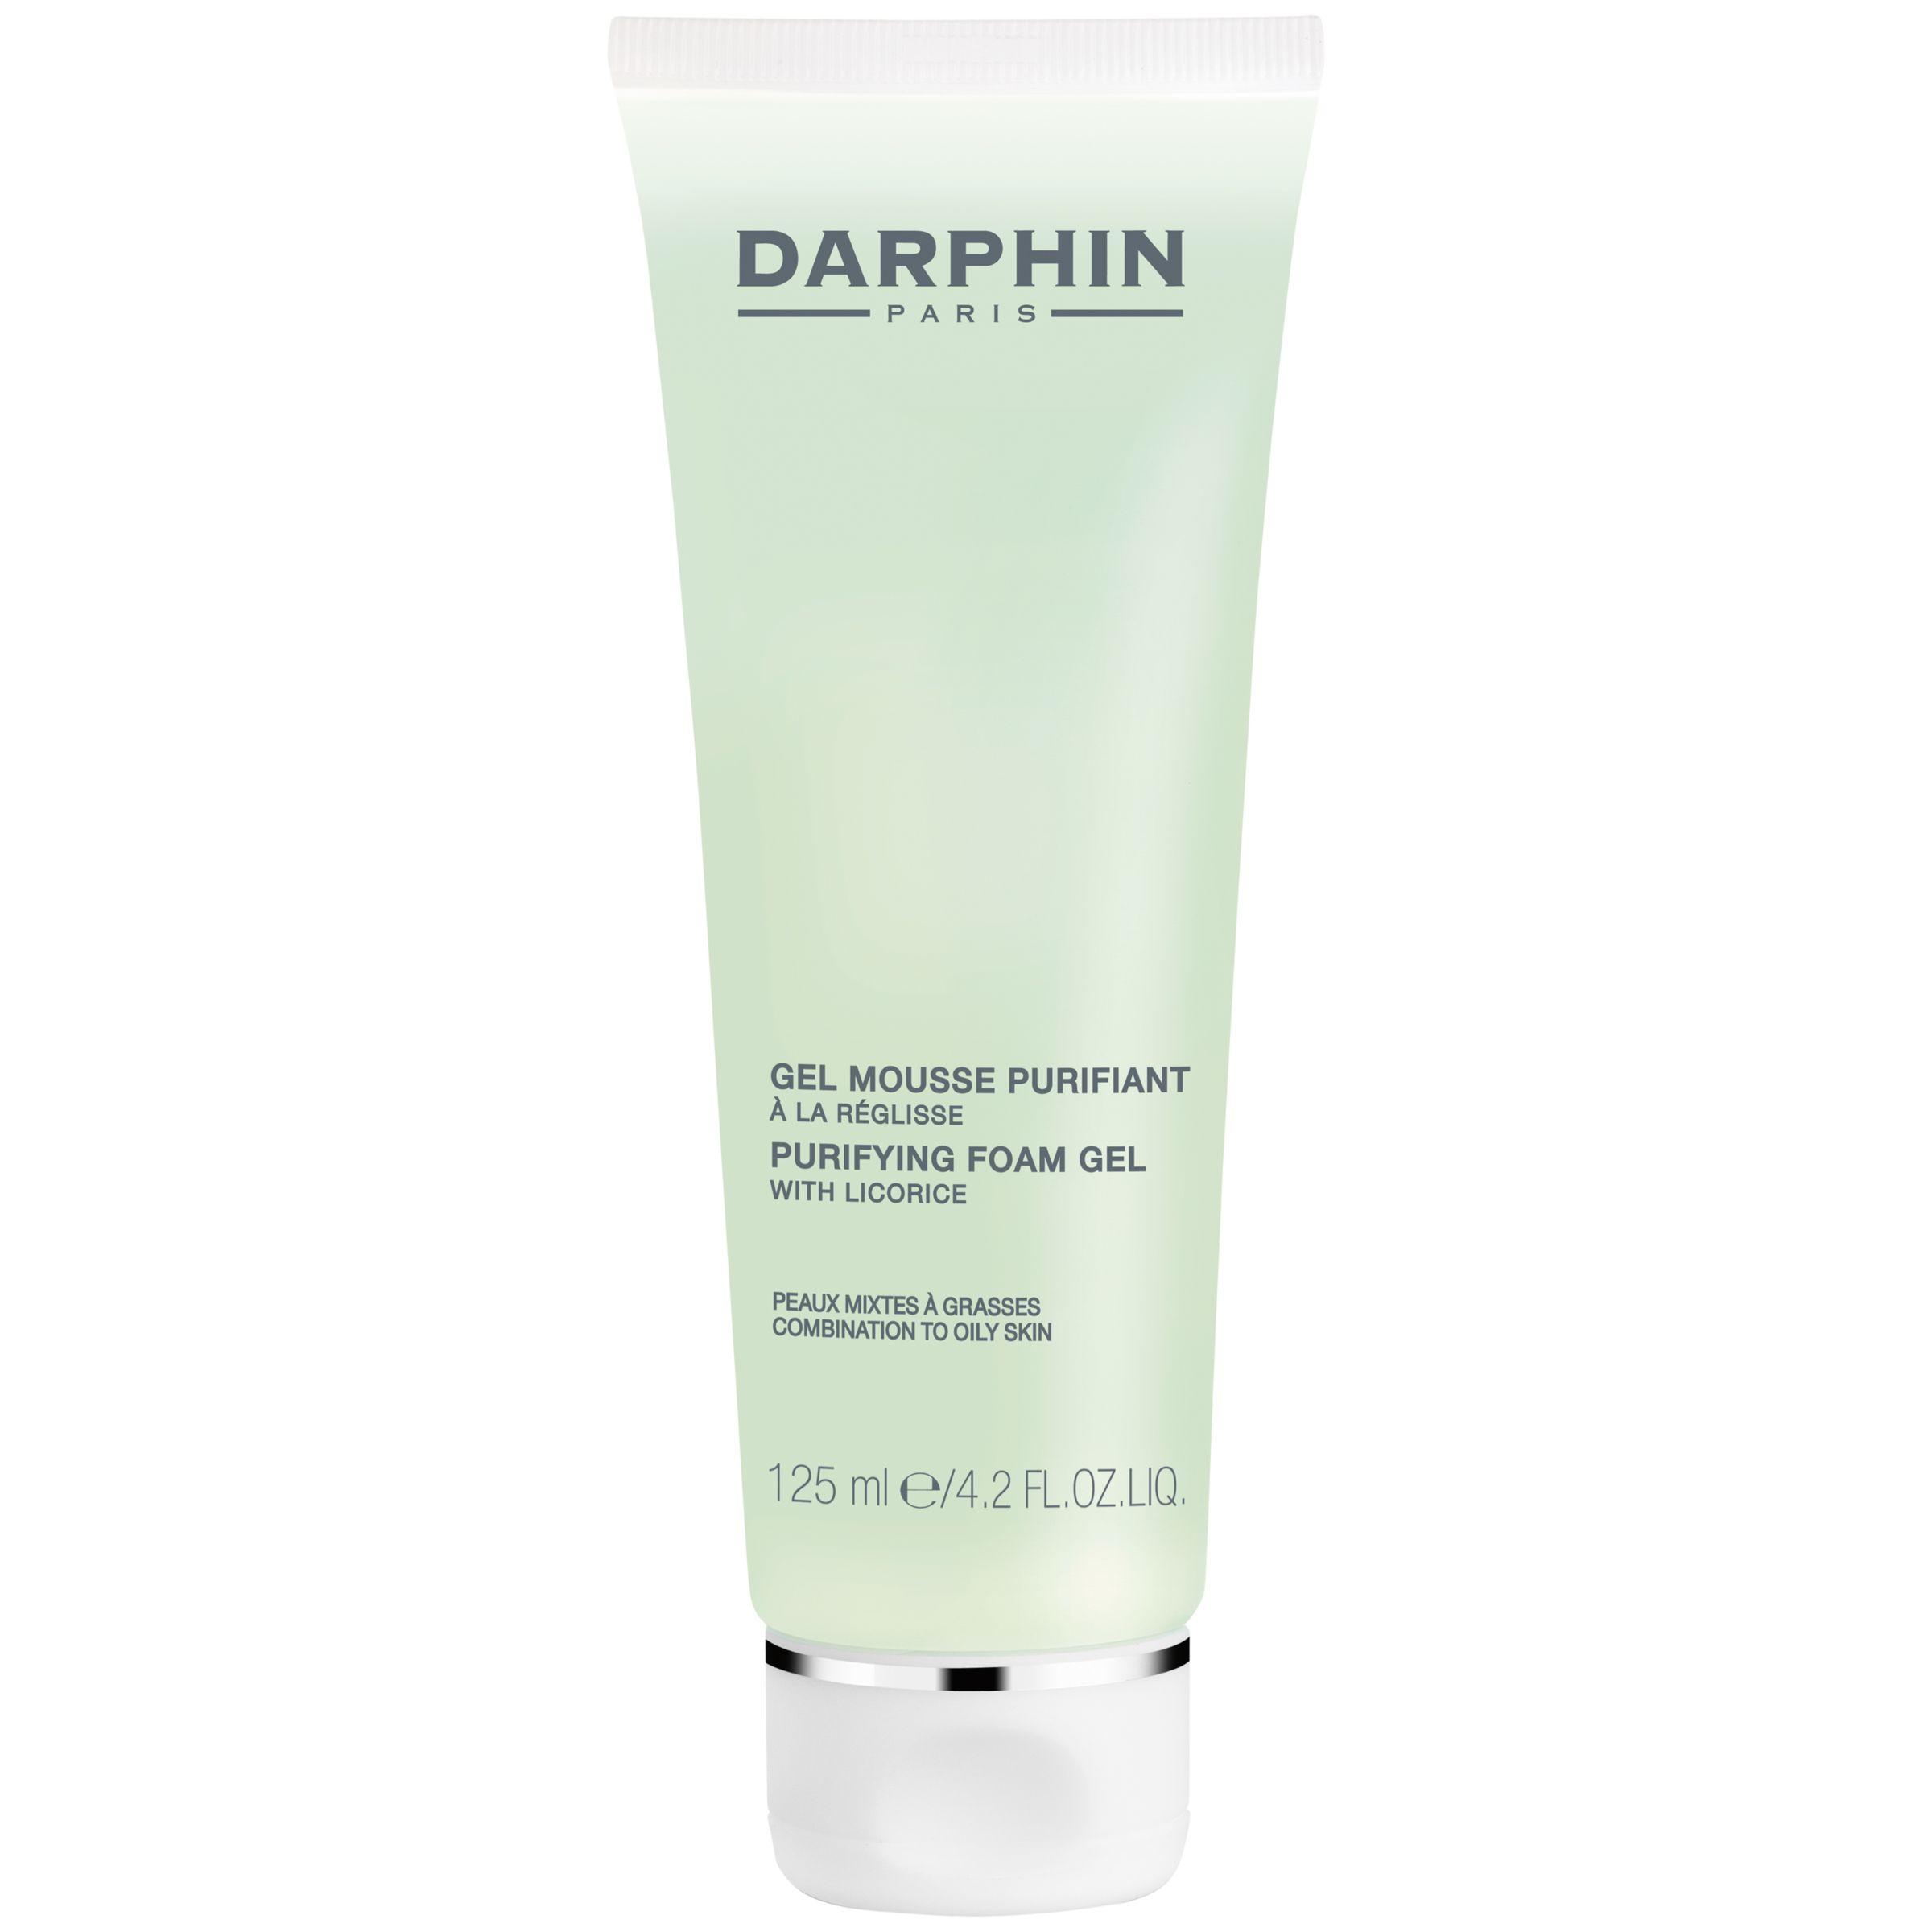 Darphin Darphin Purifying Licorice Foam Gel, 125ml